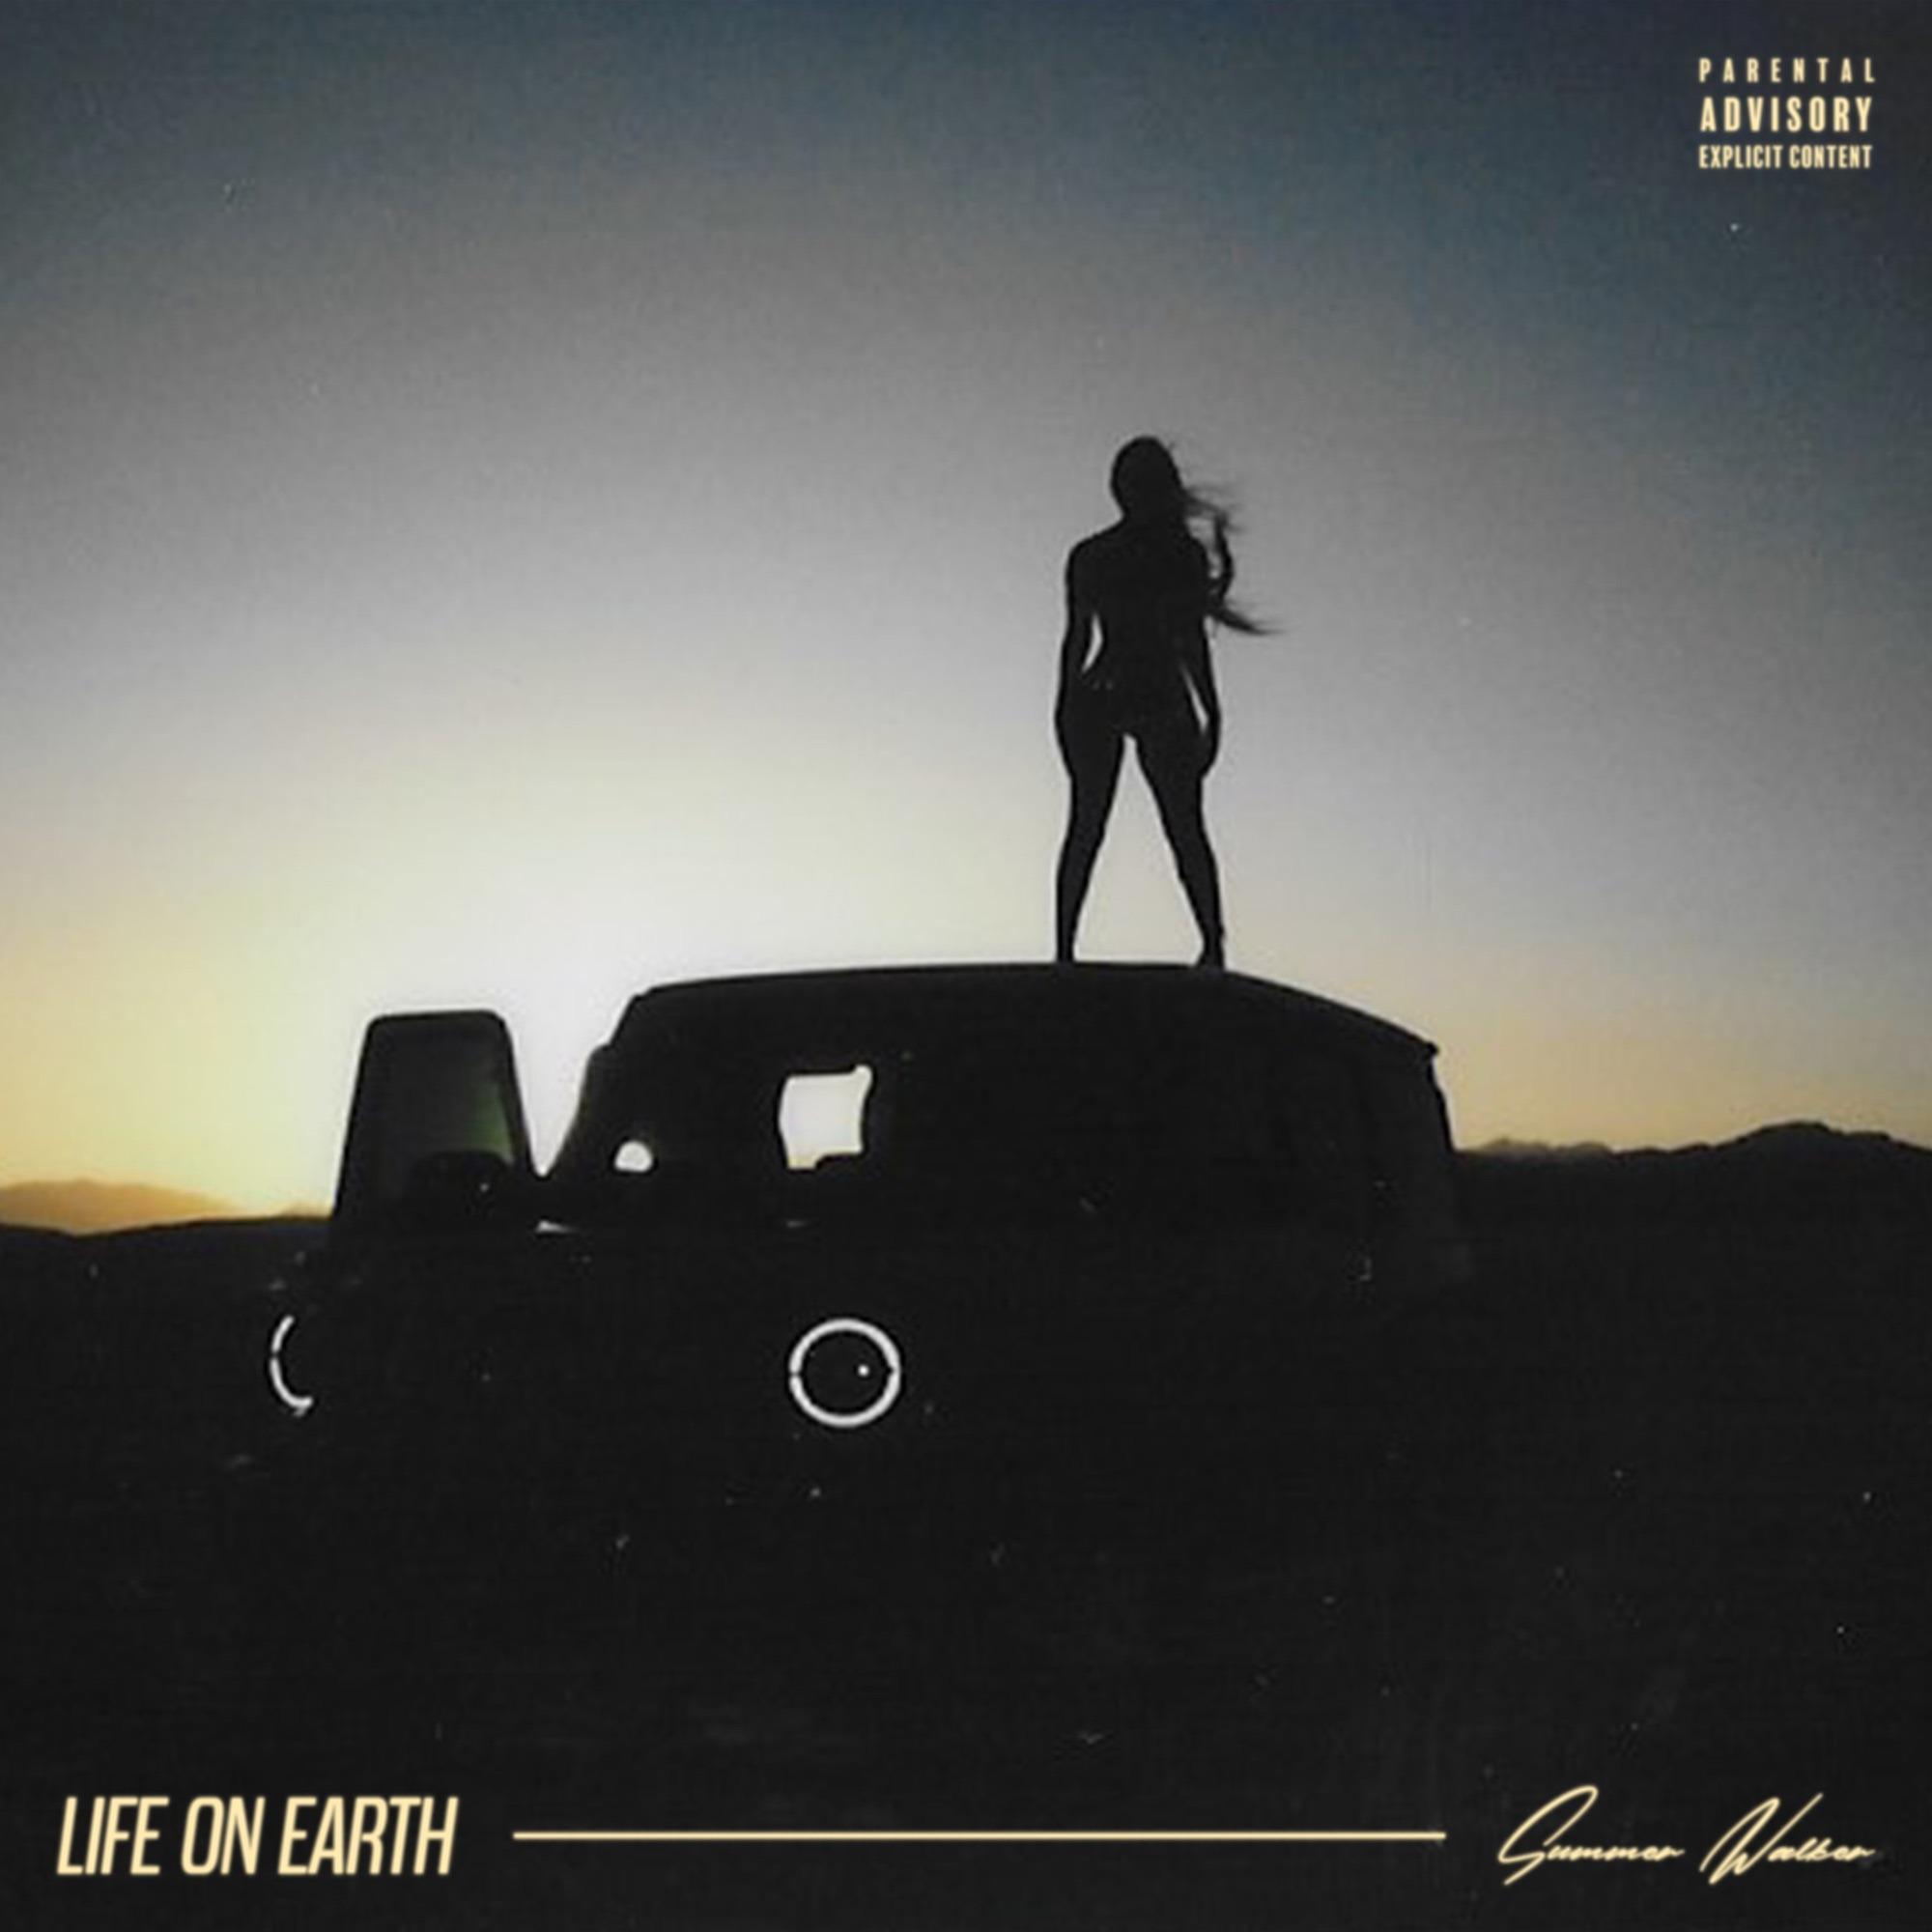 Summer Walker - Life On Earth (EP Stream)